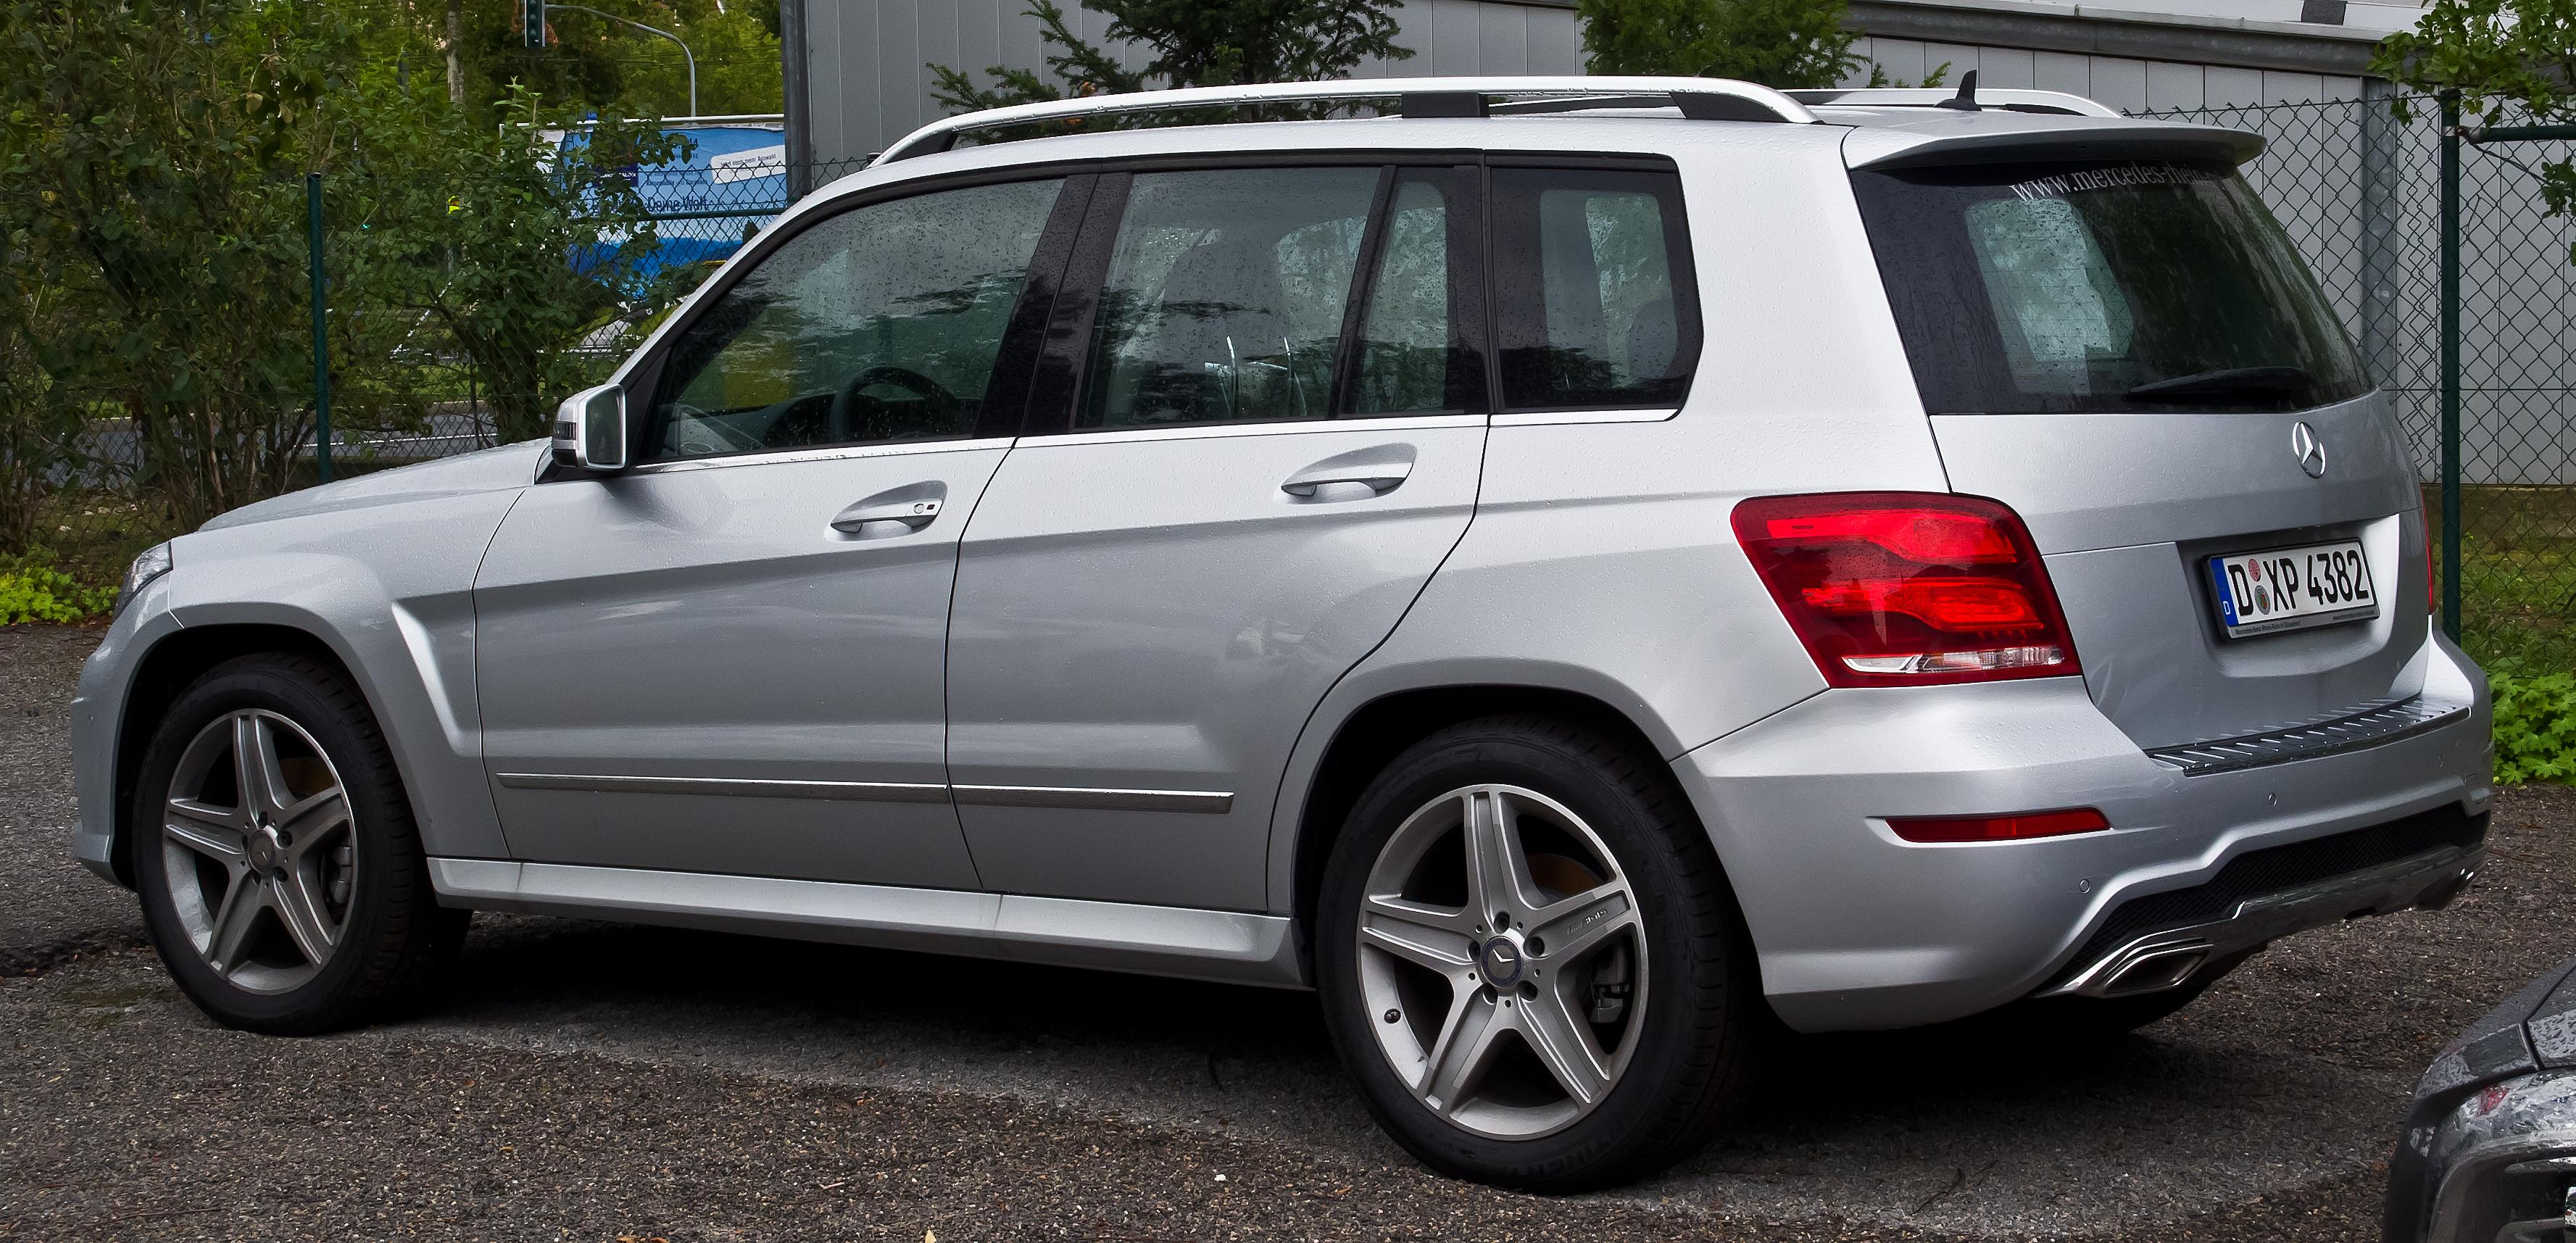 File mercedes benz glk 220 cdi 4matic sport paket amg x for Mercedes benz glk 2014